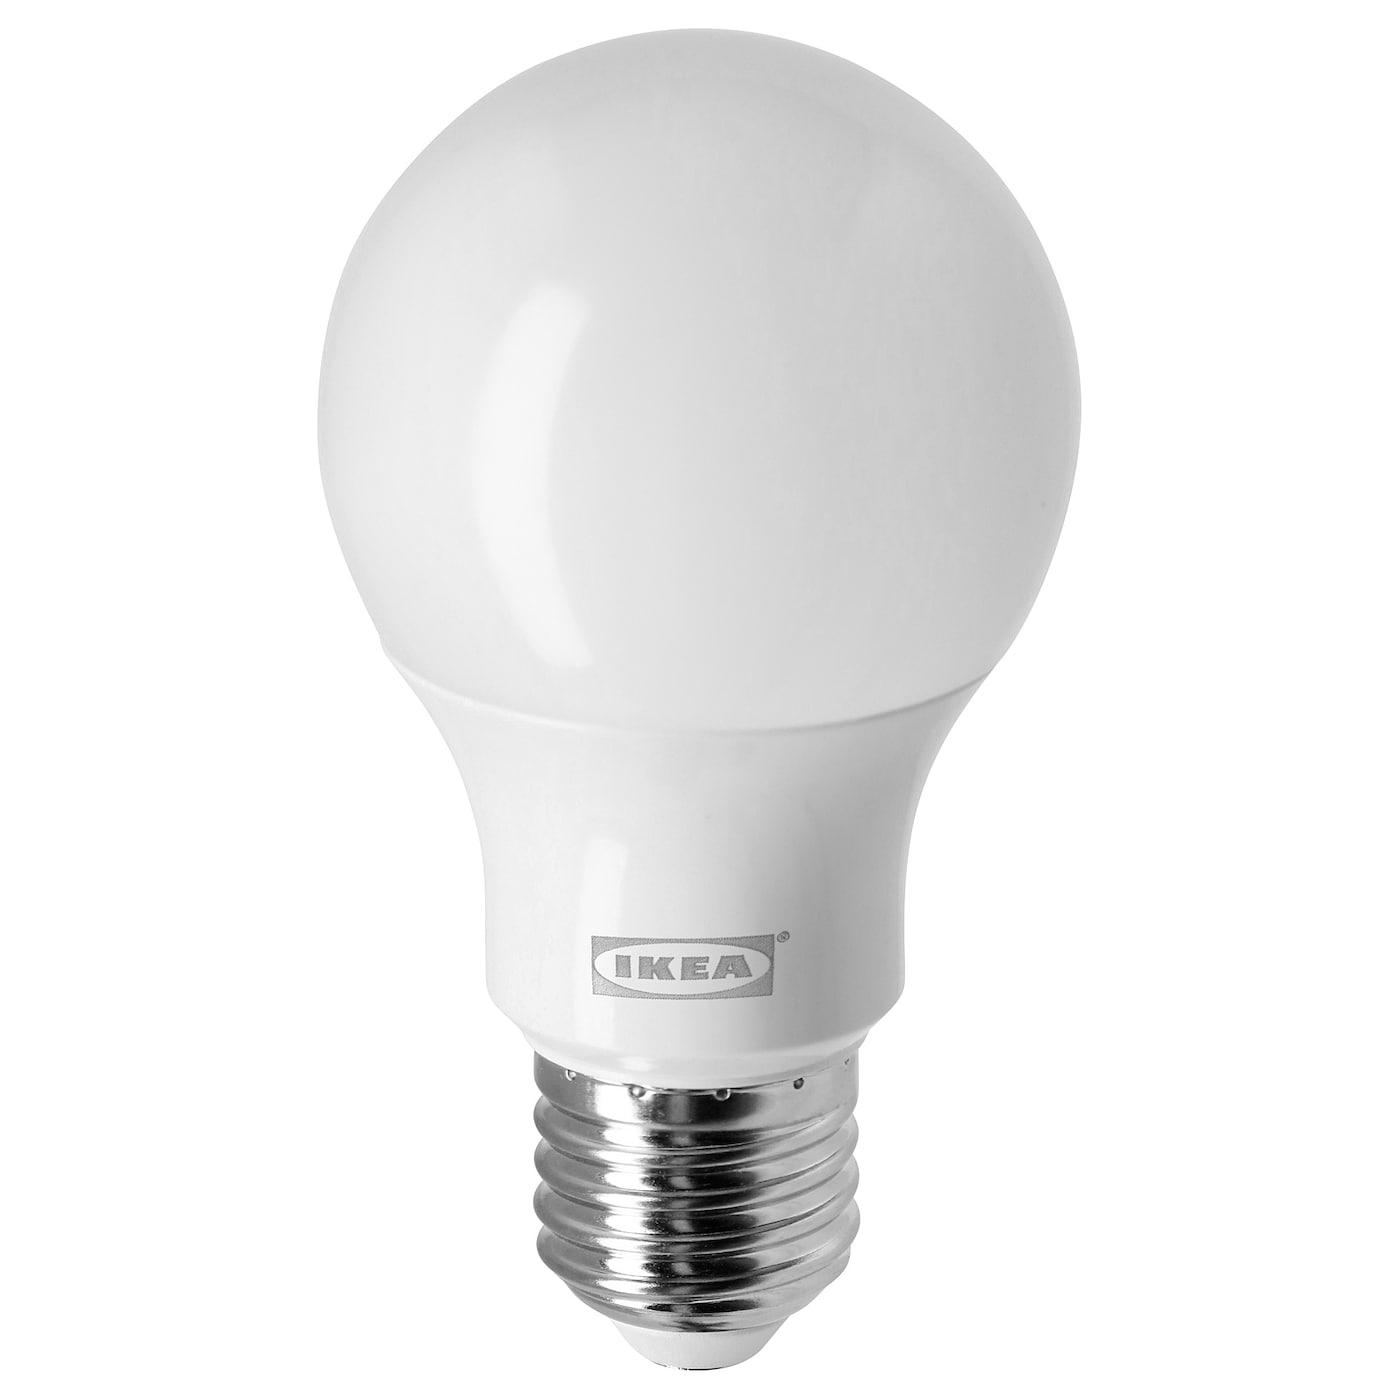 RYET Led-lamppu E27 470 lm - pallonmuotoinen opaalinvalkoinen